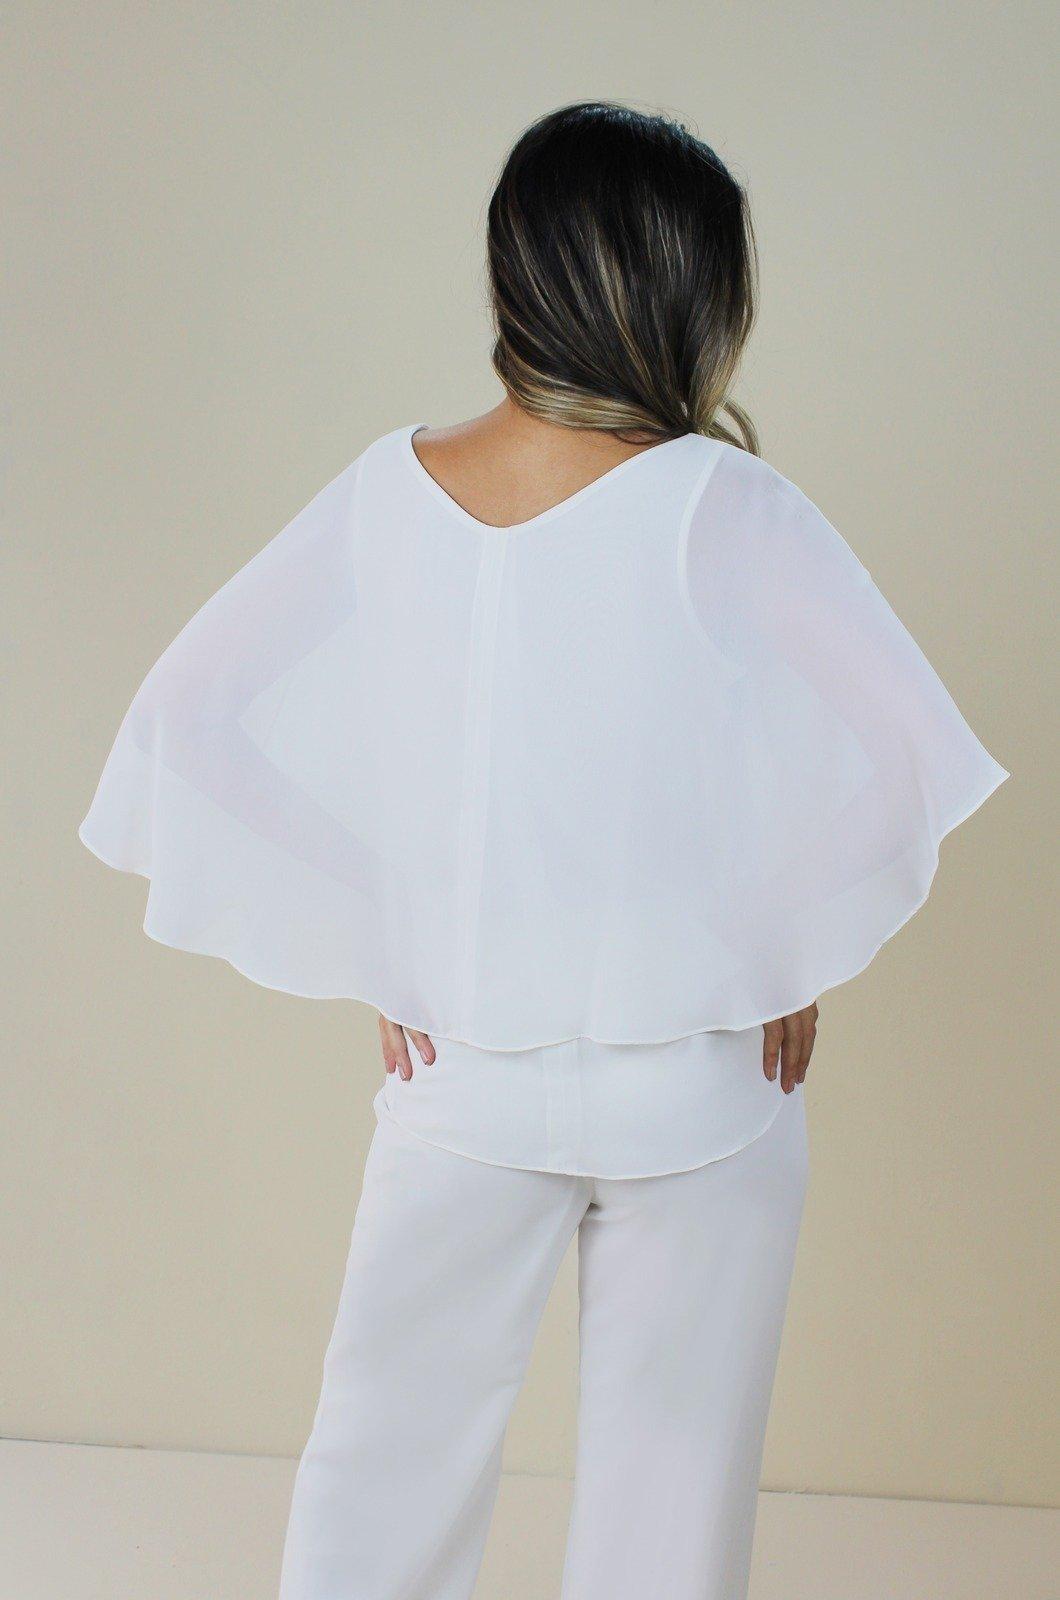 Blusa chiffon capa en espalda - Chazari